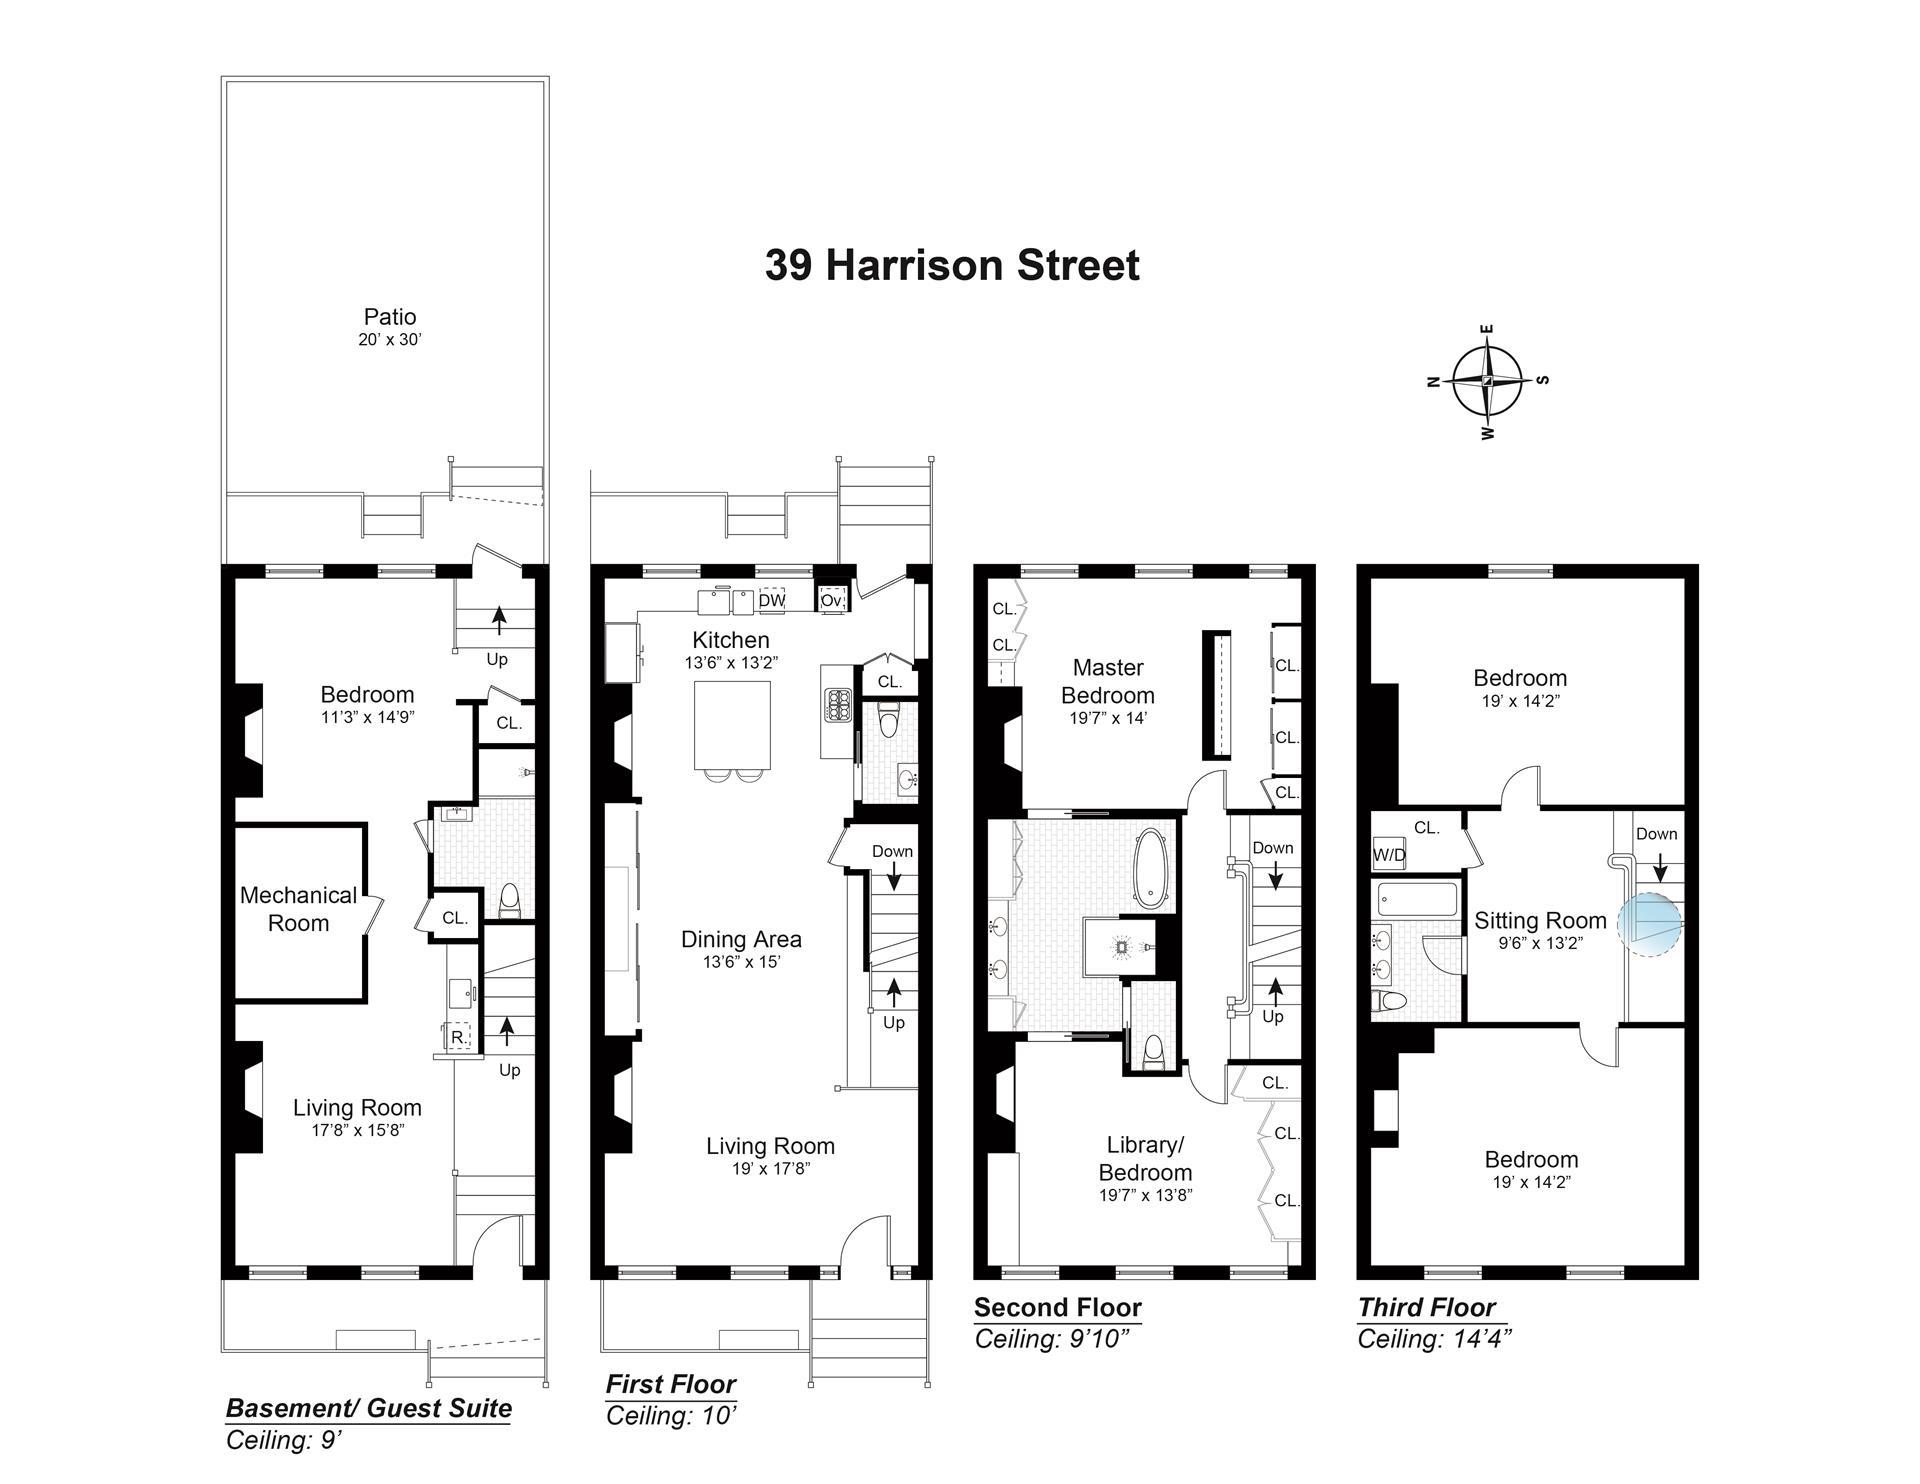 Floor plan of 39 Harrison Street - TriBeCa, New York